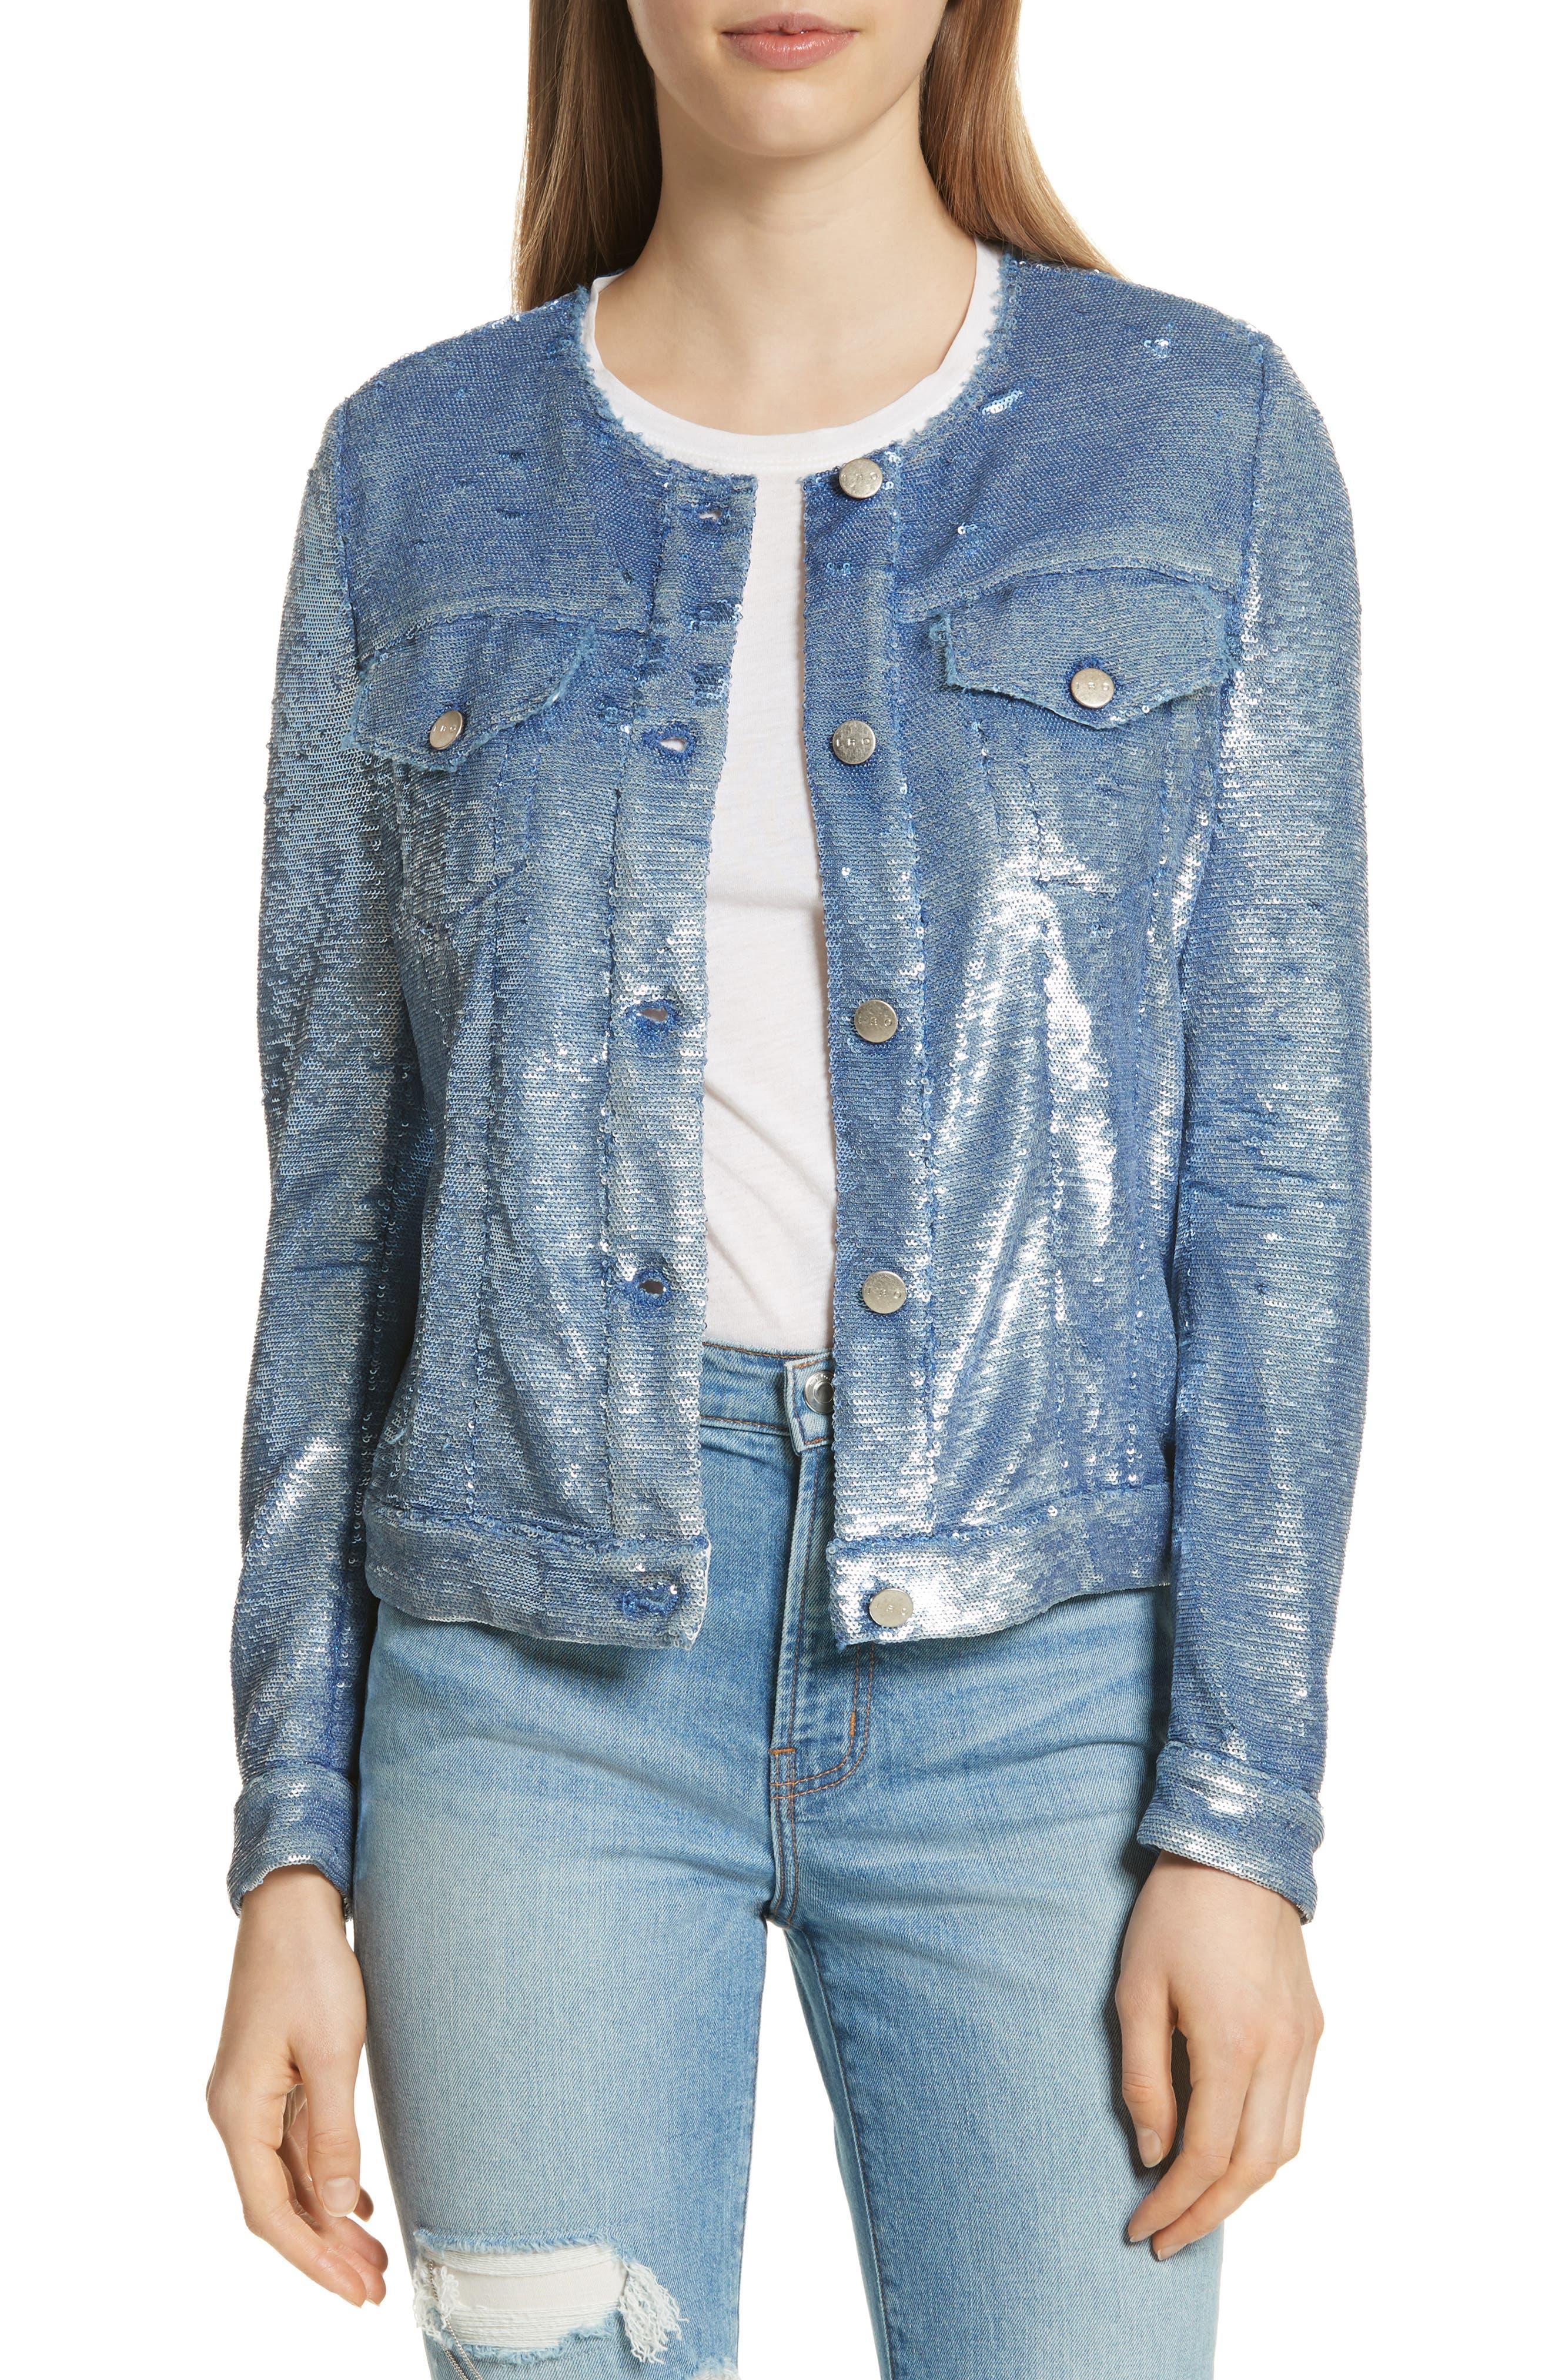 Dalome Sequin Jacket,                             Main thumbnail 1, color,                             Blushed Blue